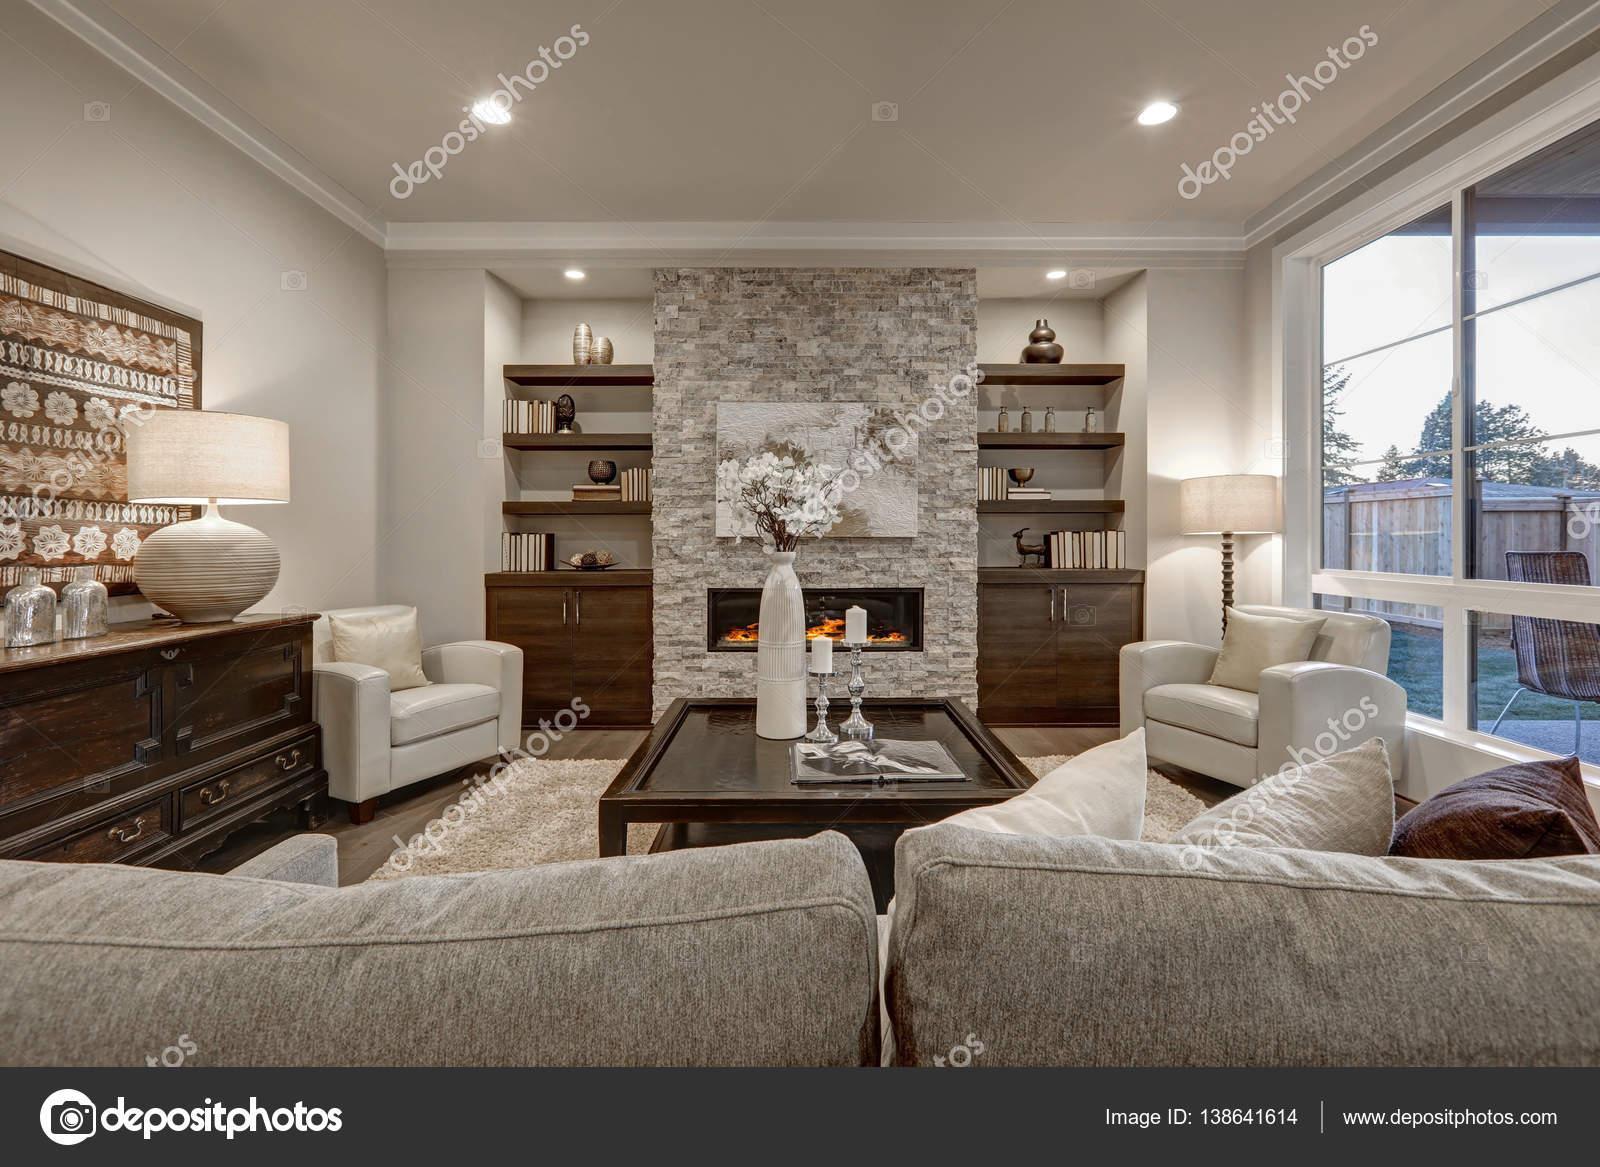 Zeer grijs interieur woonkamer fj 13 blessingbox for Grijze woonkamer